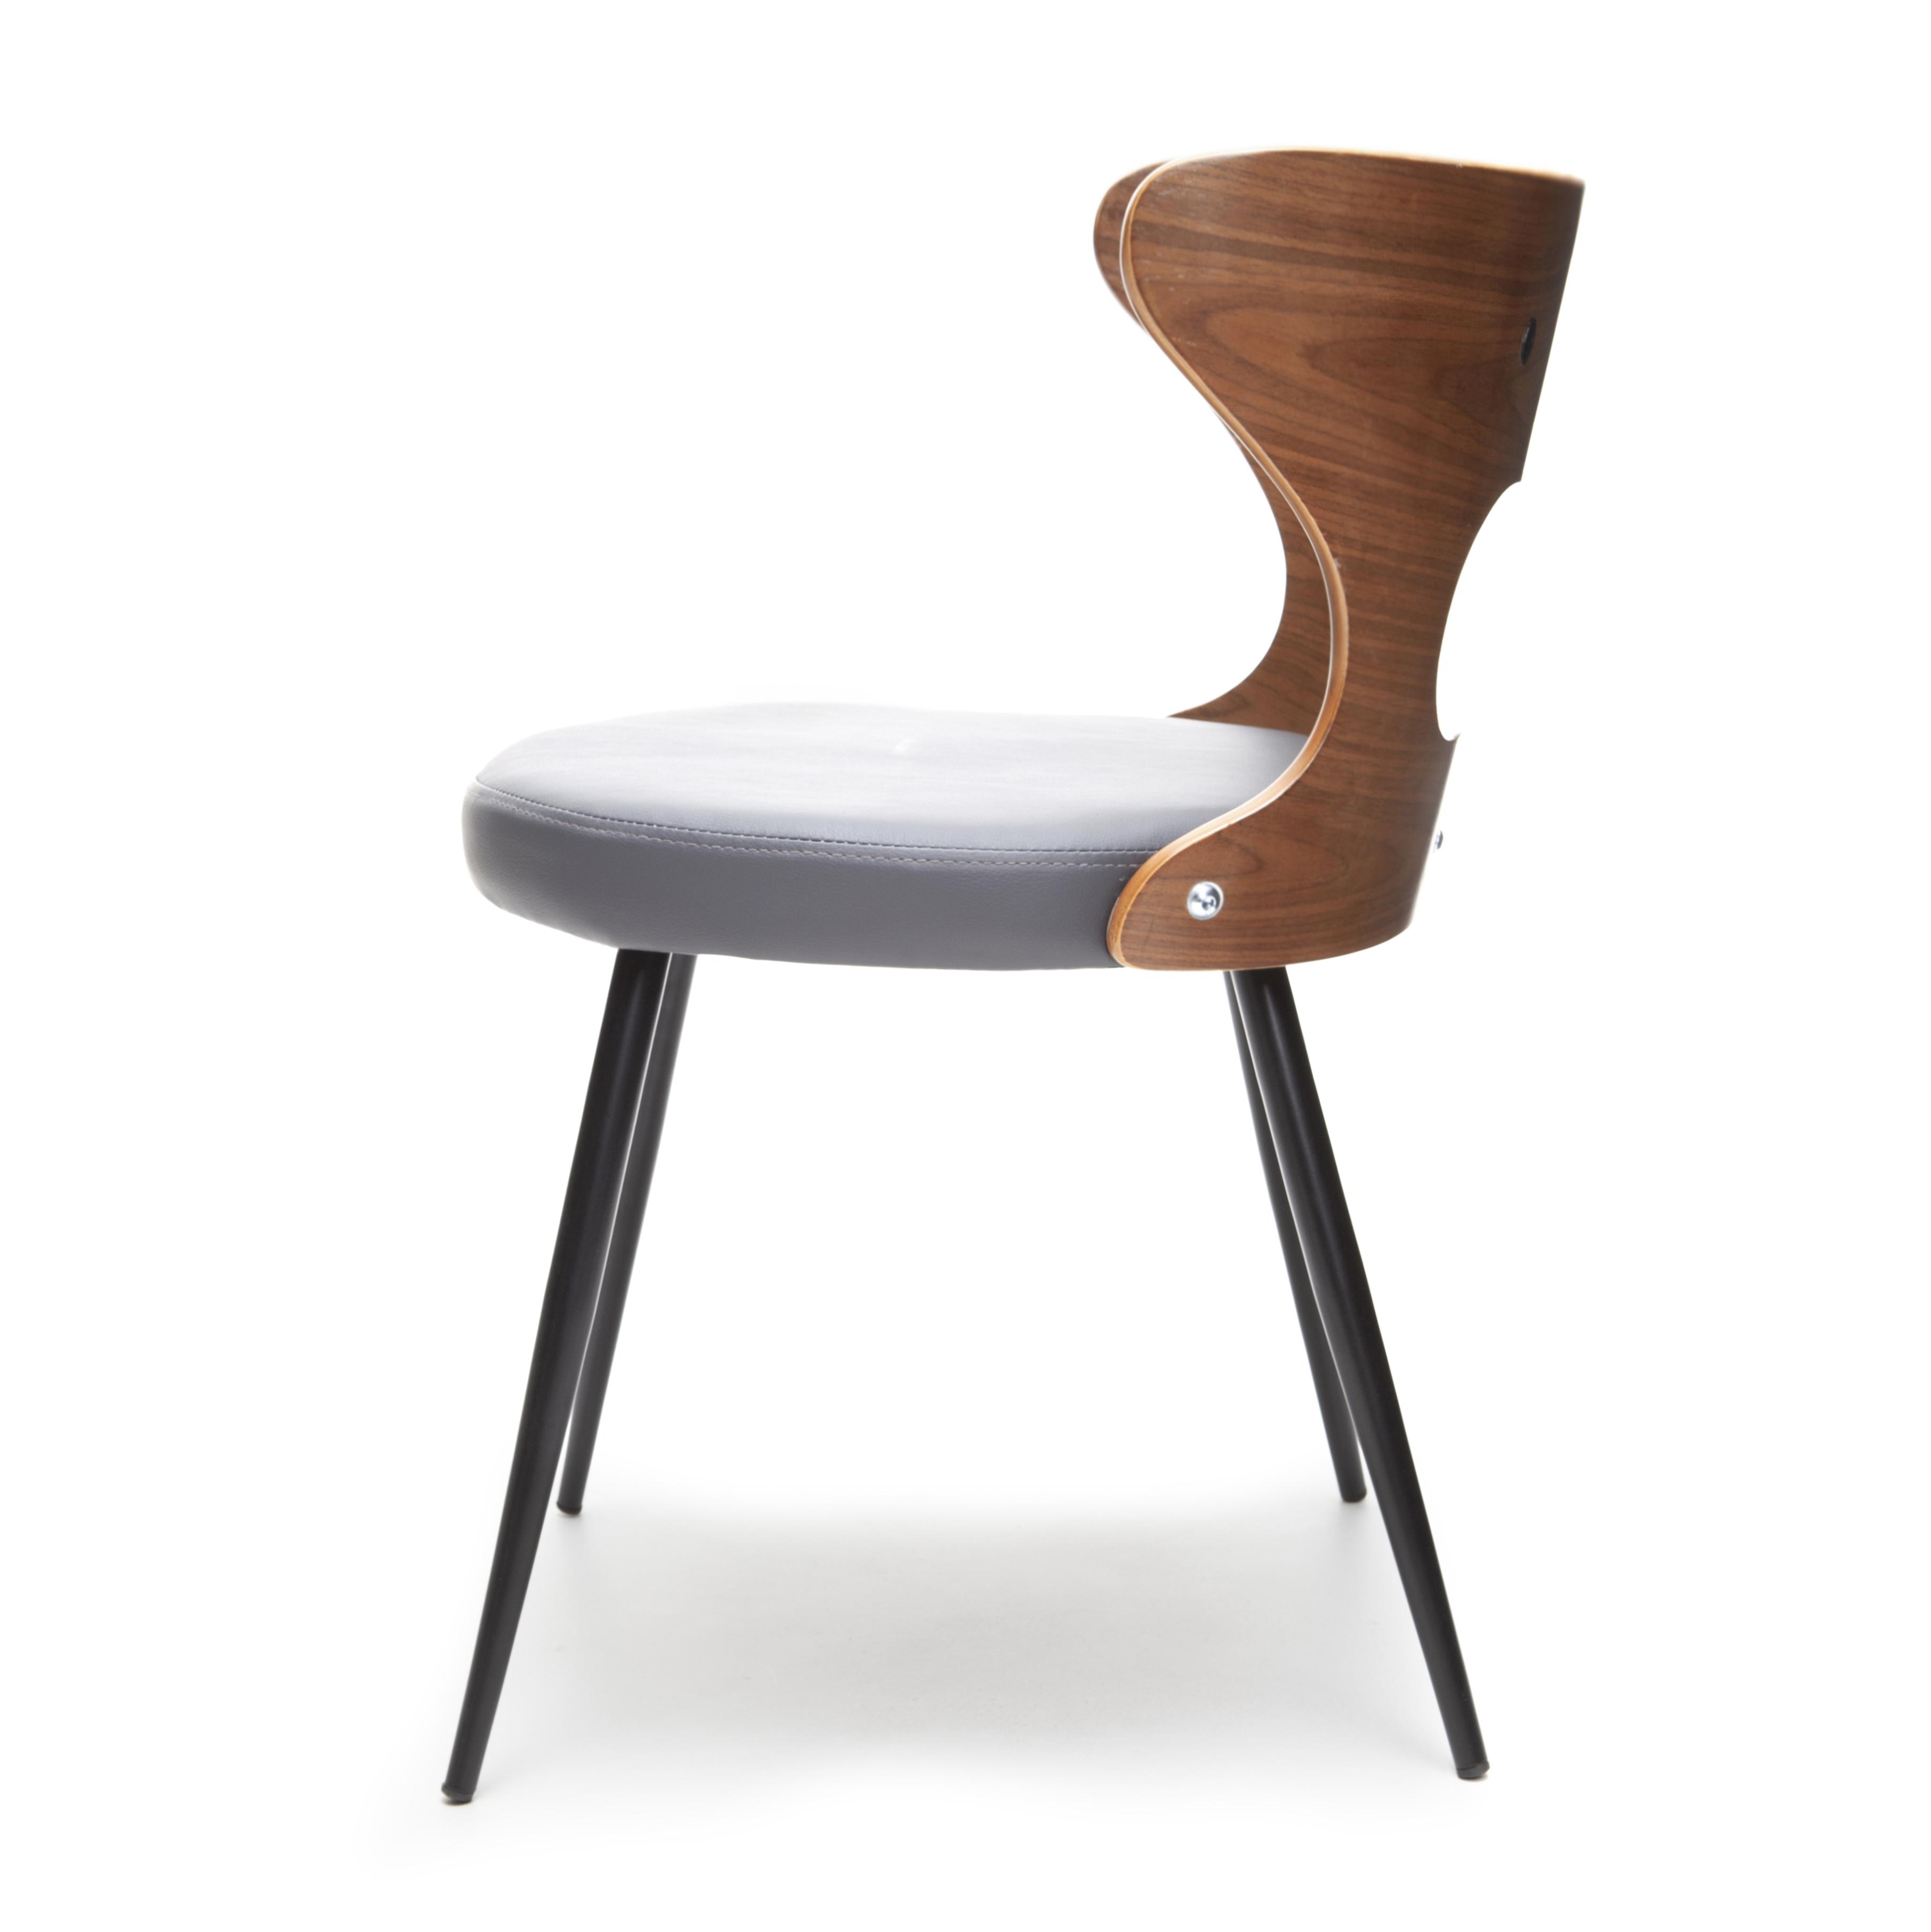 Stoel Vejen - Grijs/Walnoot - LiL Design